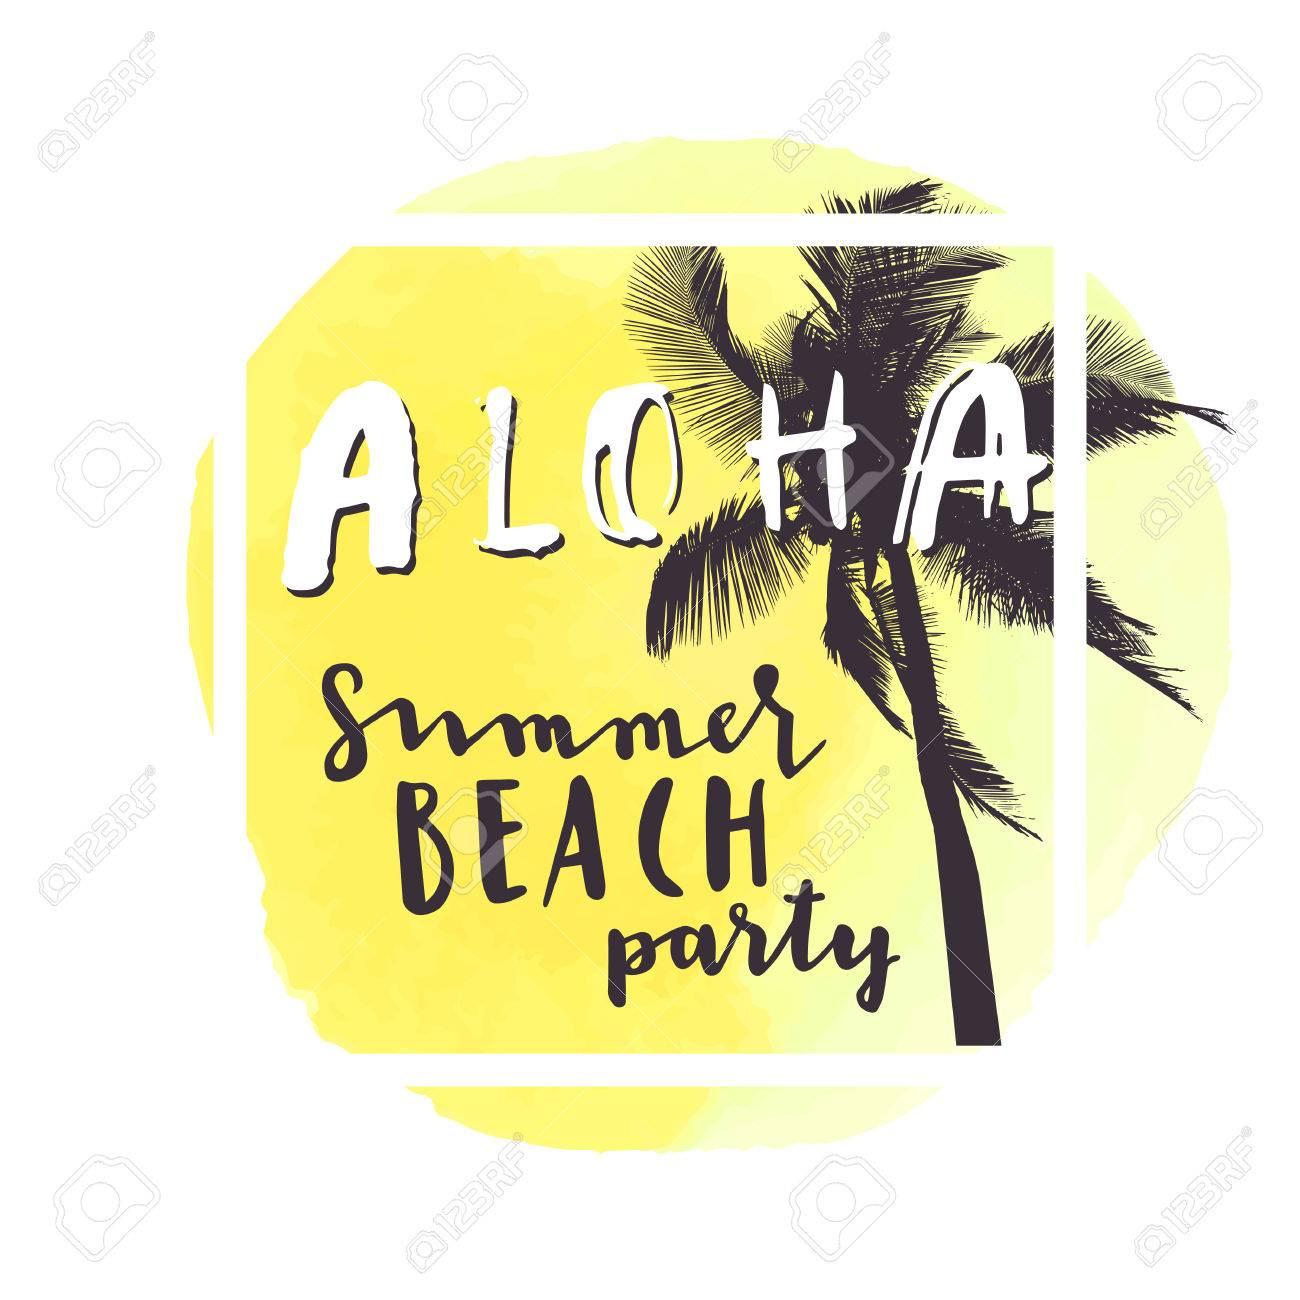 aloha summer beach party yellow watercolor hand drawn greeting